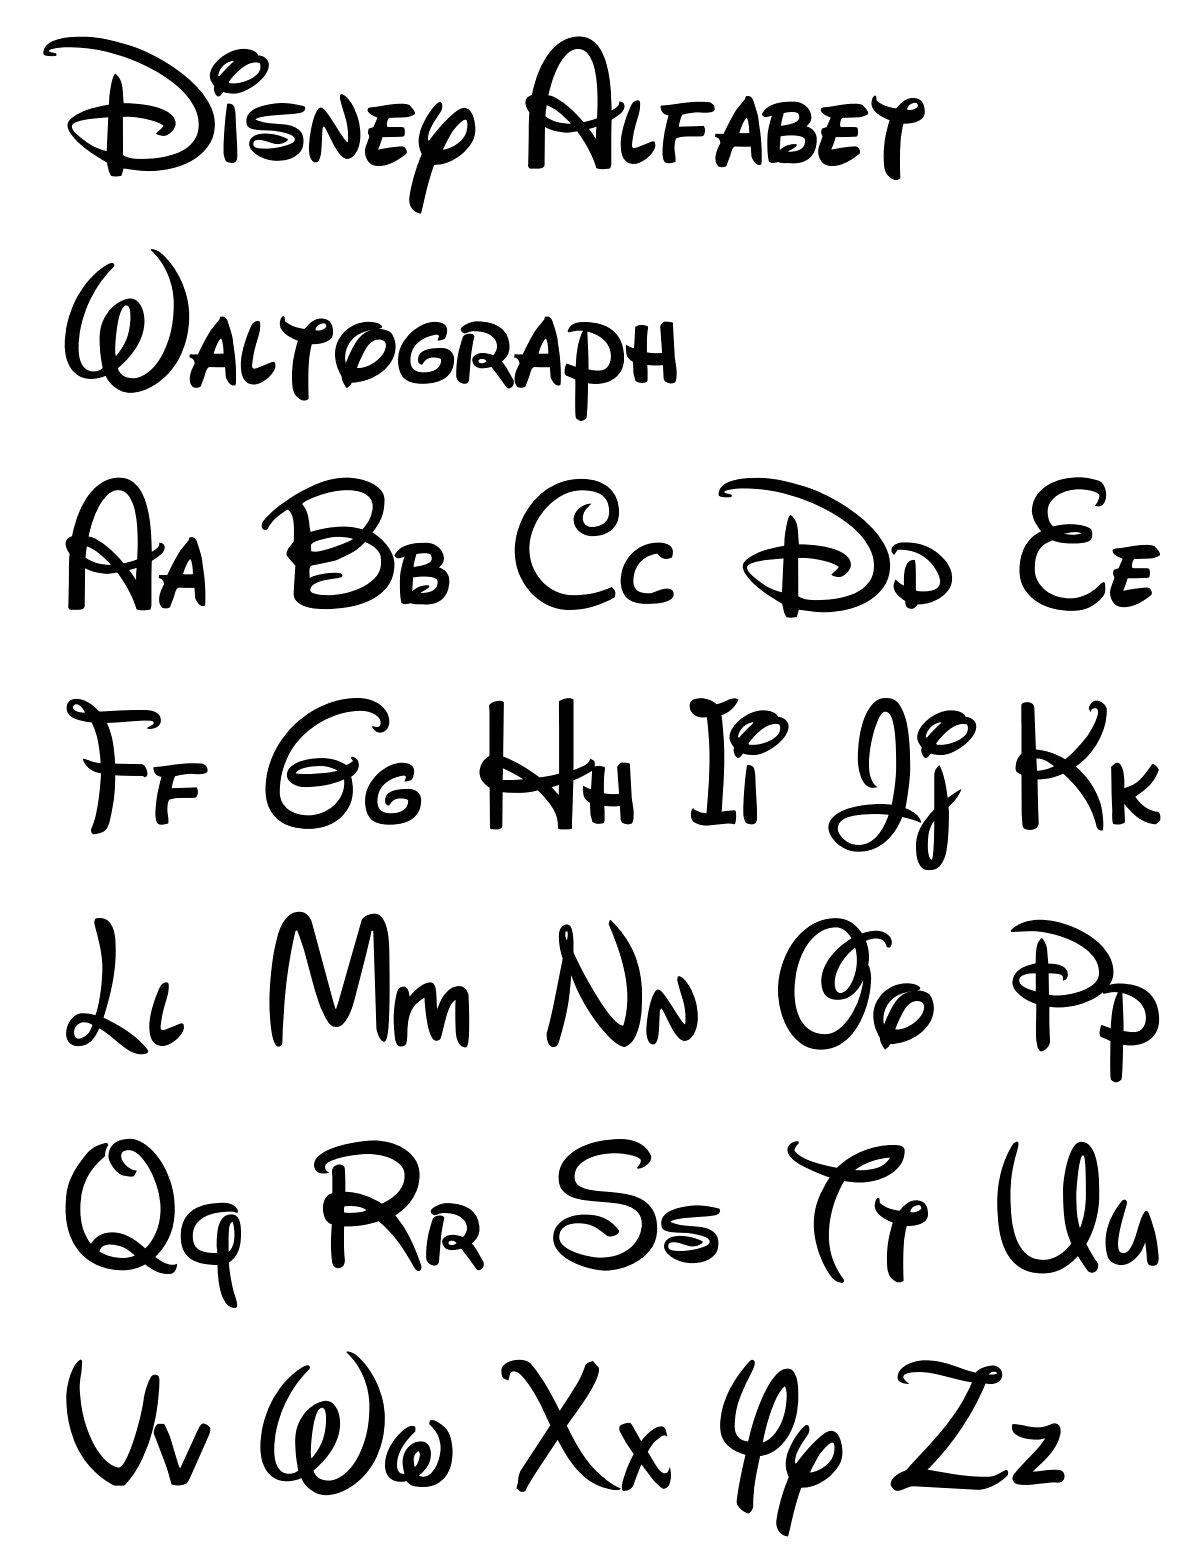 Free Printable Disney Letter Stencils | Disney In 2019 | Disney - Free Printable Calligraphy Letter Stencils